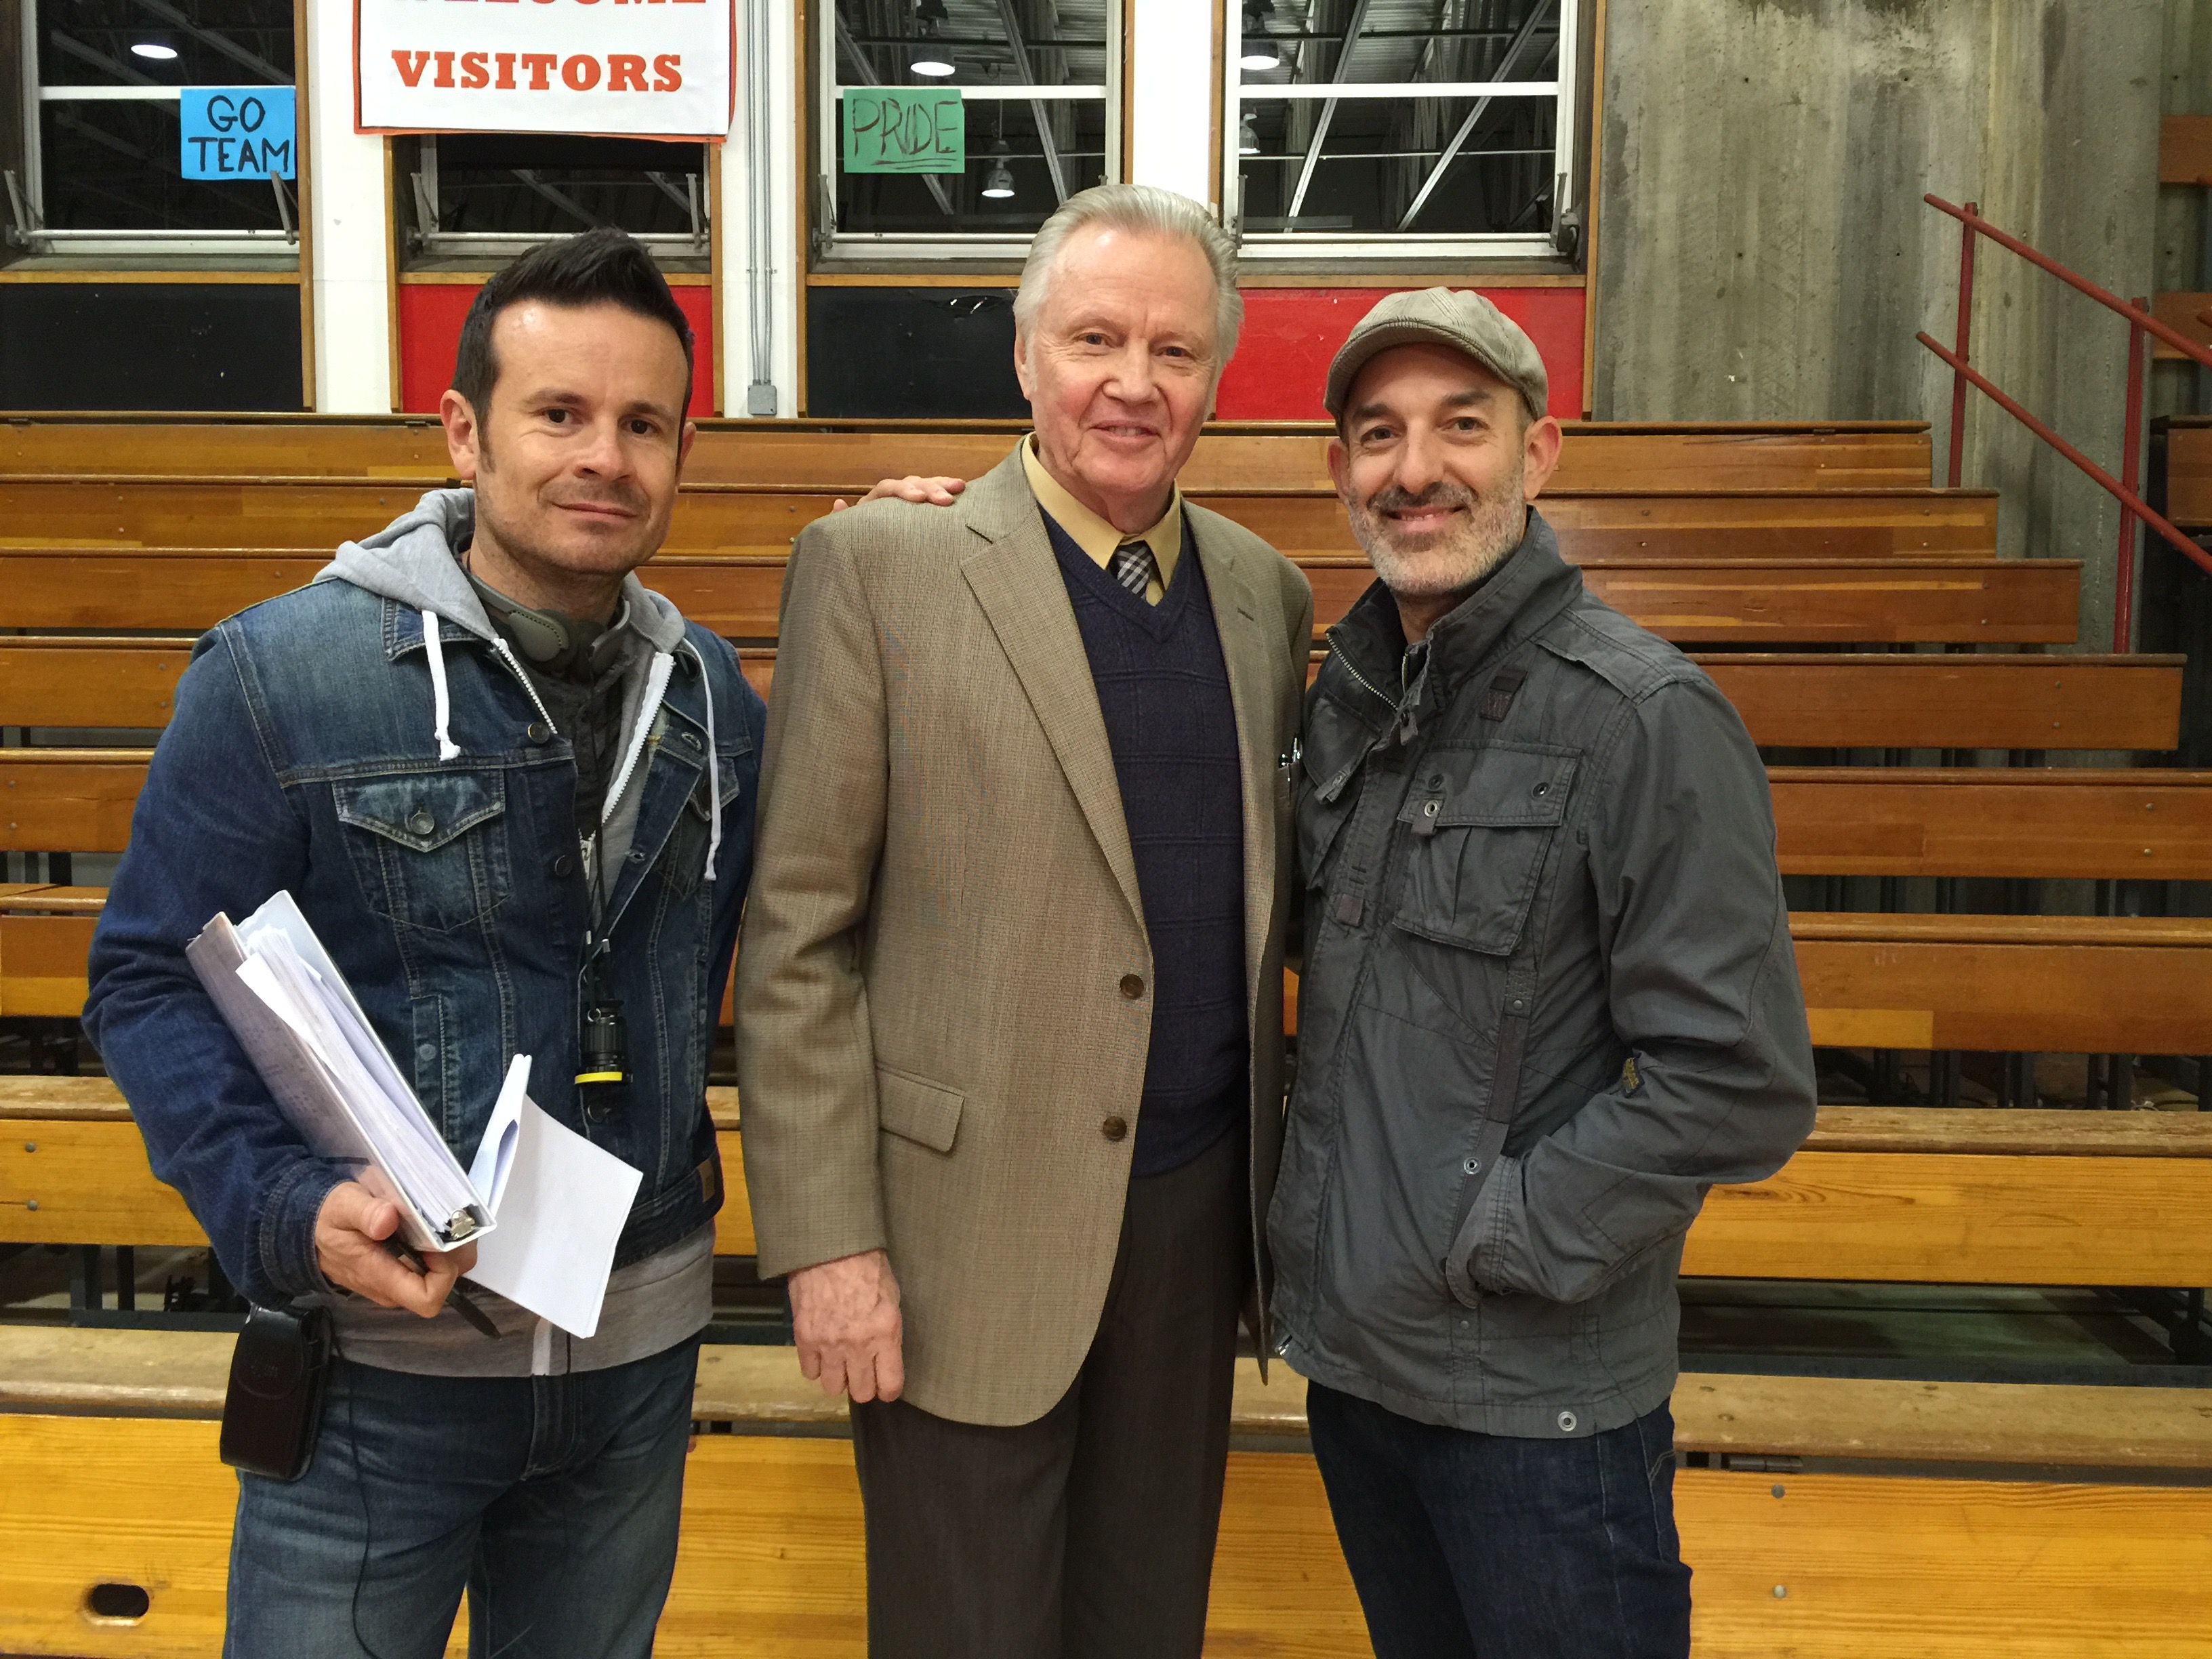 Director Alex Ranarivelo, Jon Voight, and Director of Photography Reuben Steinberg on the set of American Wrestler: The Wizard.